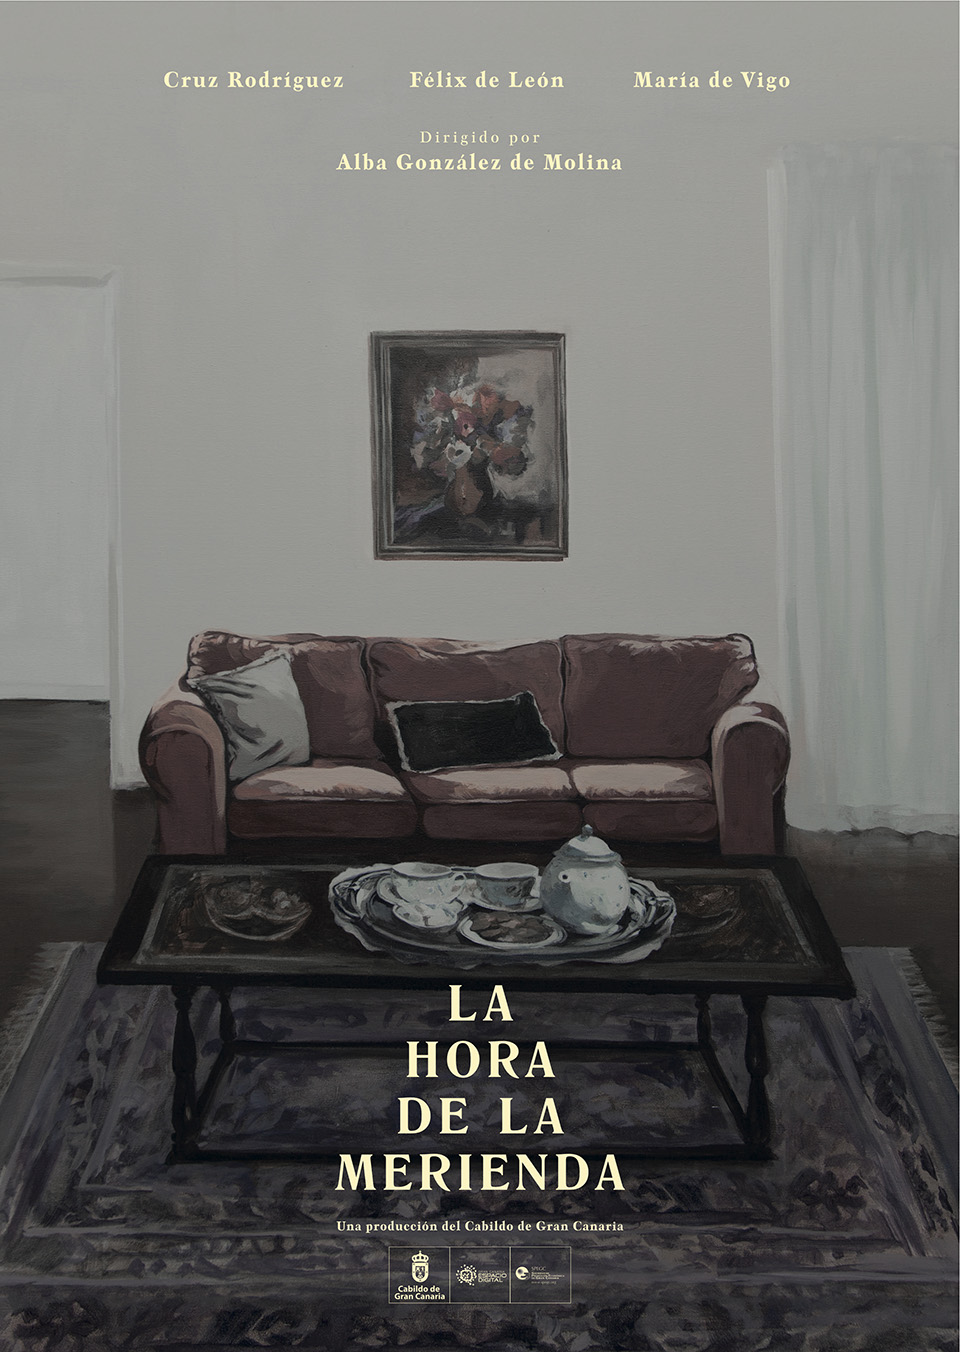 la-hora-de-la-merienda-cortos-festival-cine-mujeres-zgz-2018